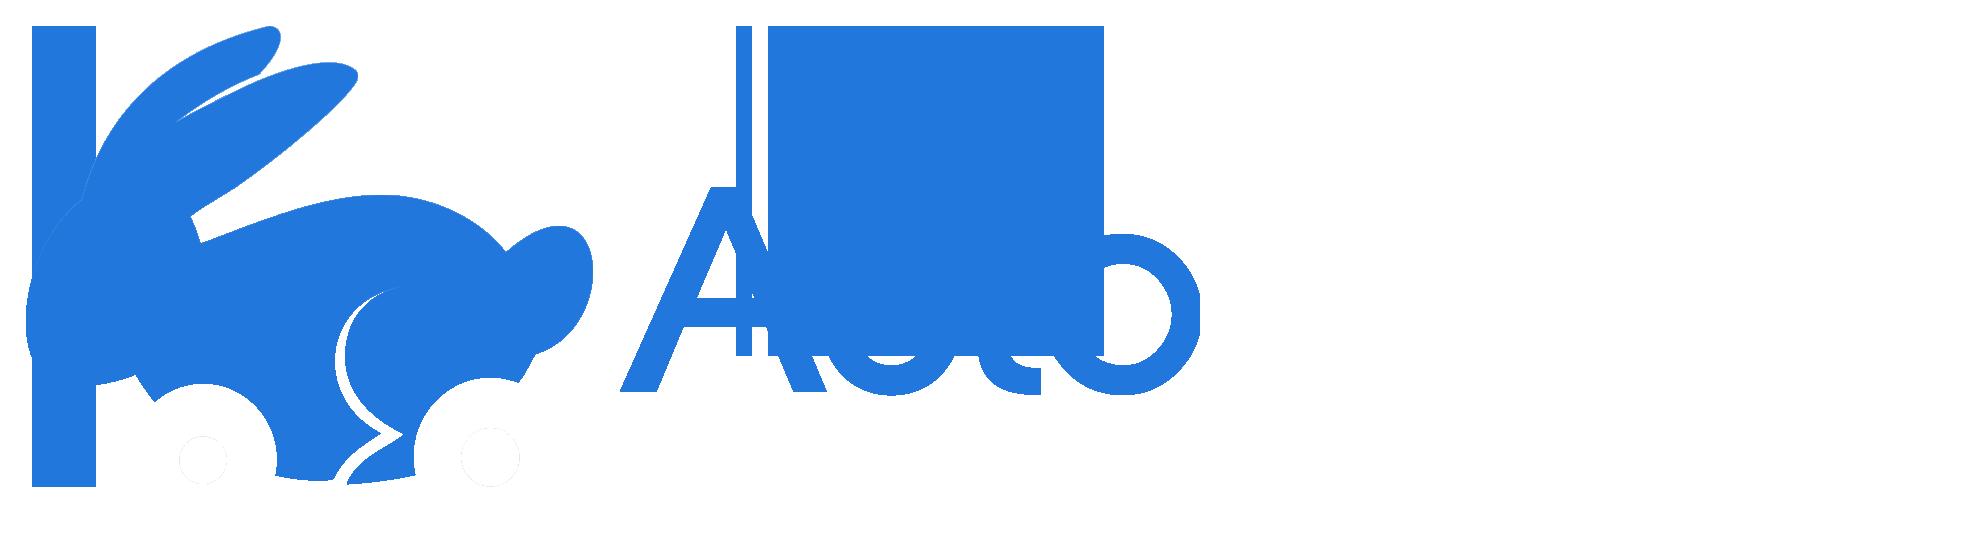 AUTOBUNNY DEALER SOLUTIONS